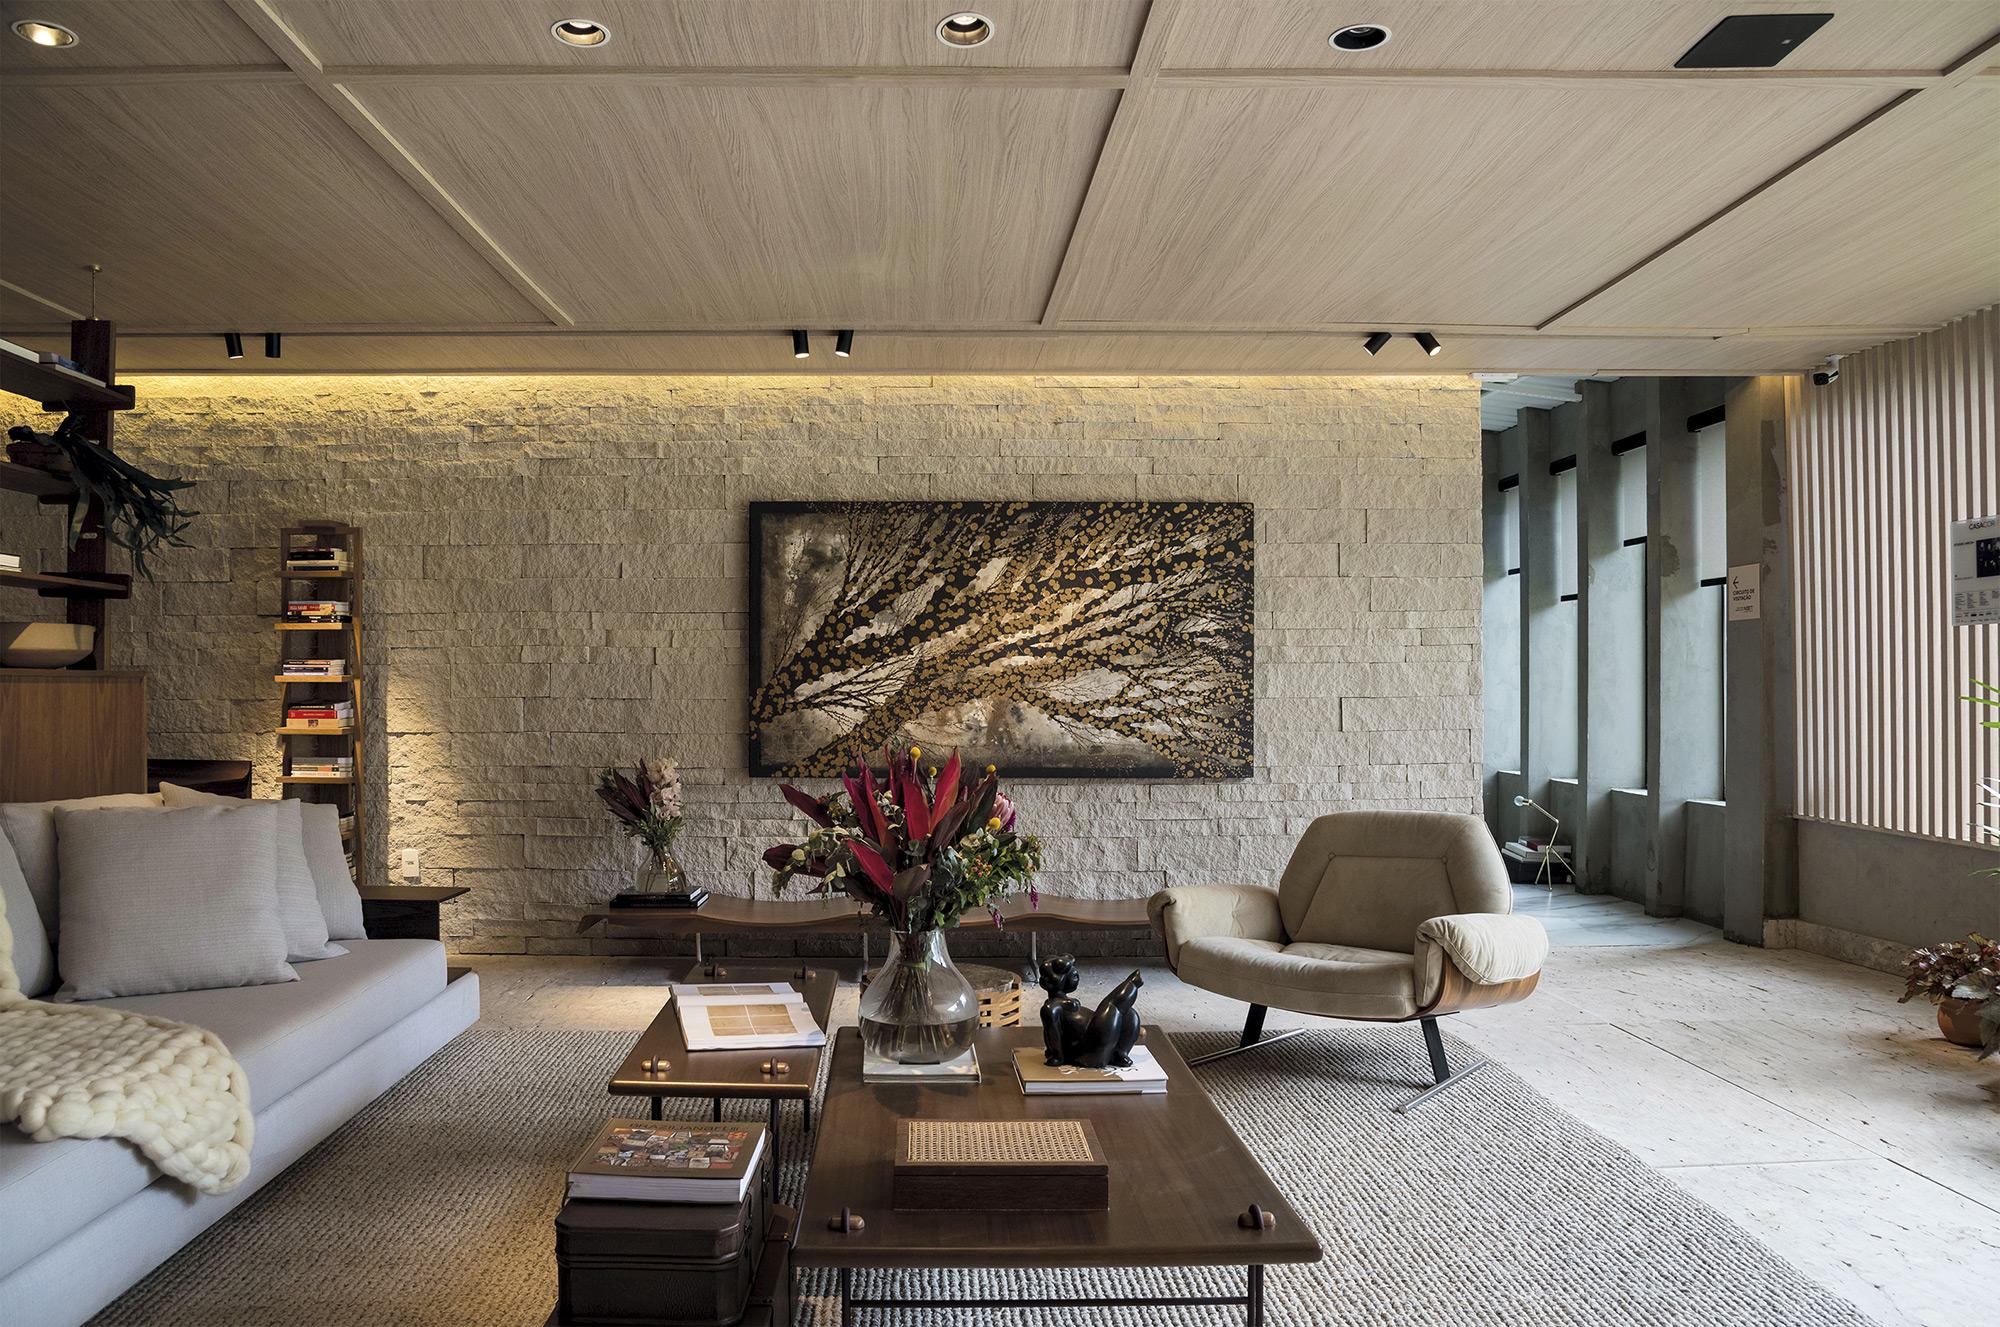 Ecobrick Stone Marfim - Casa Cor Brasilia 2018 - Studio Arch - Foto Rafael Nadler